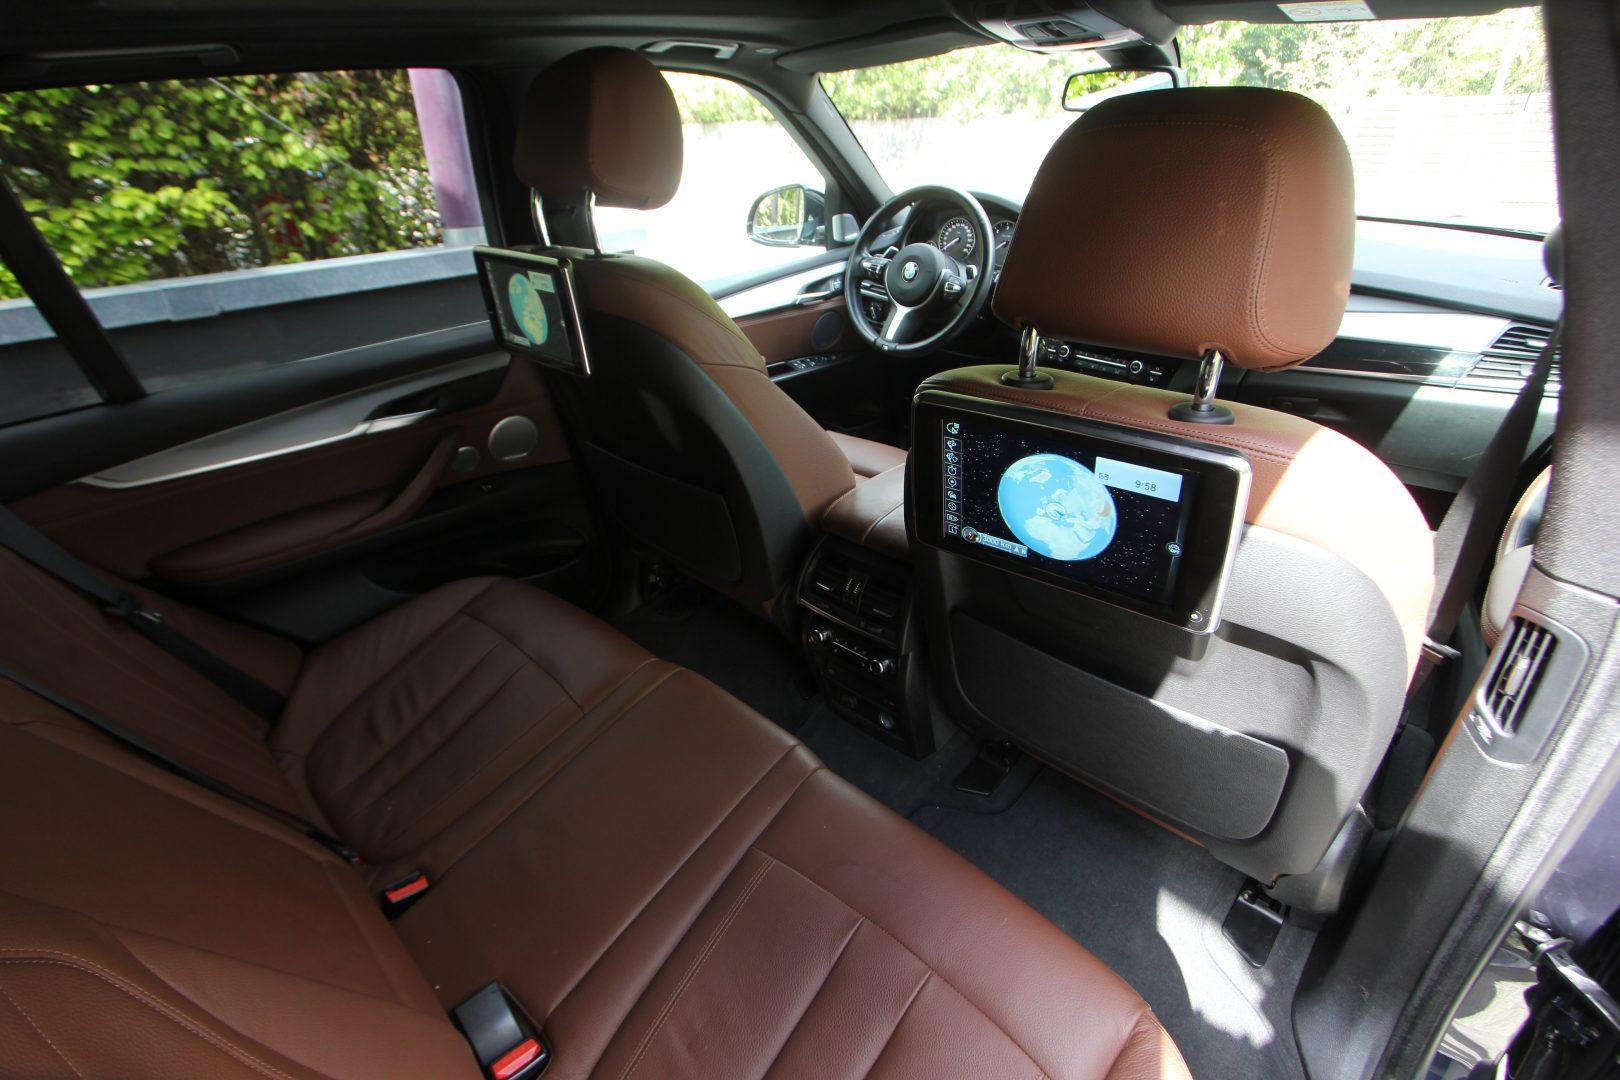 AIL BMW X5 M50d Bang & Olufsen Panorama RSE 5